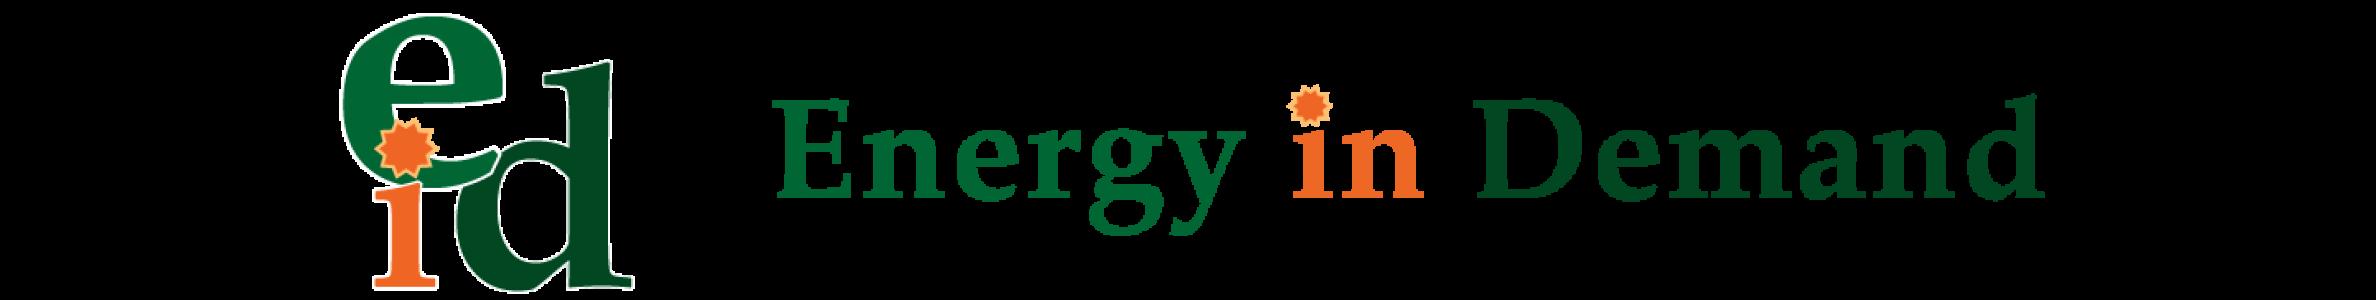 Energy in Demand – Sustainable Energy – Rod Janssen